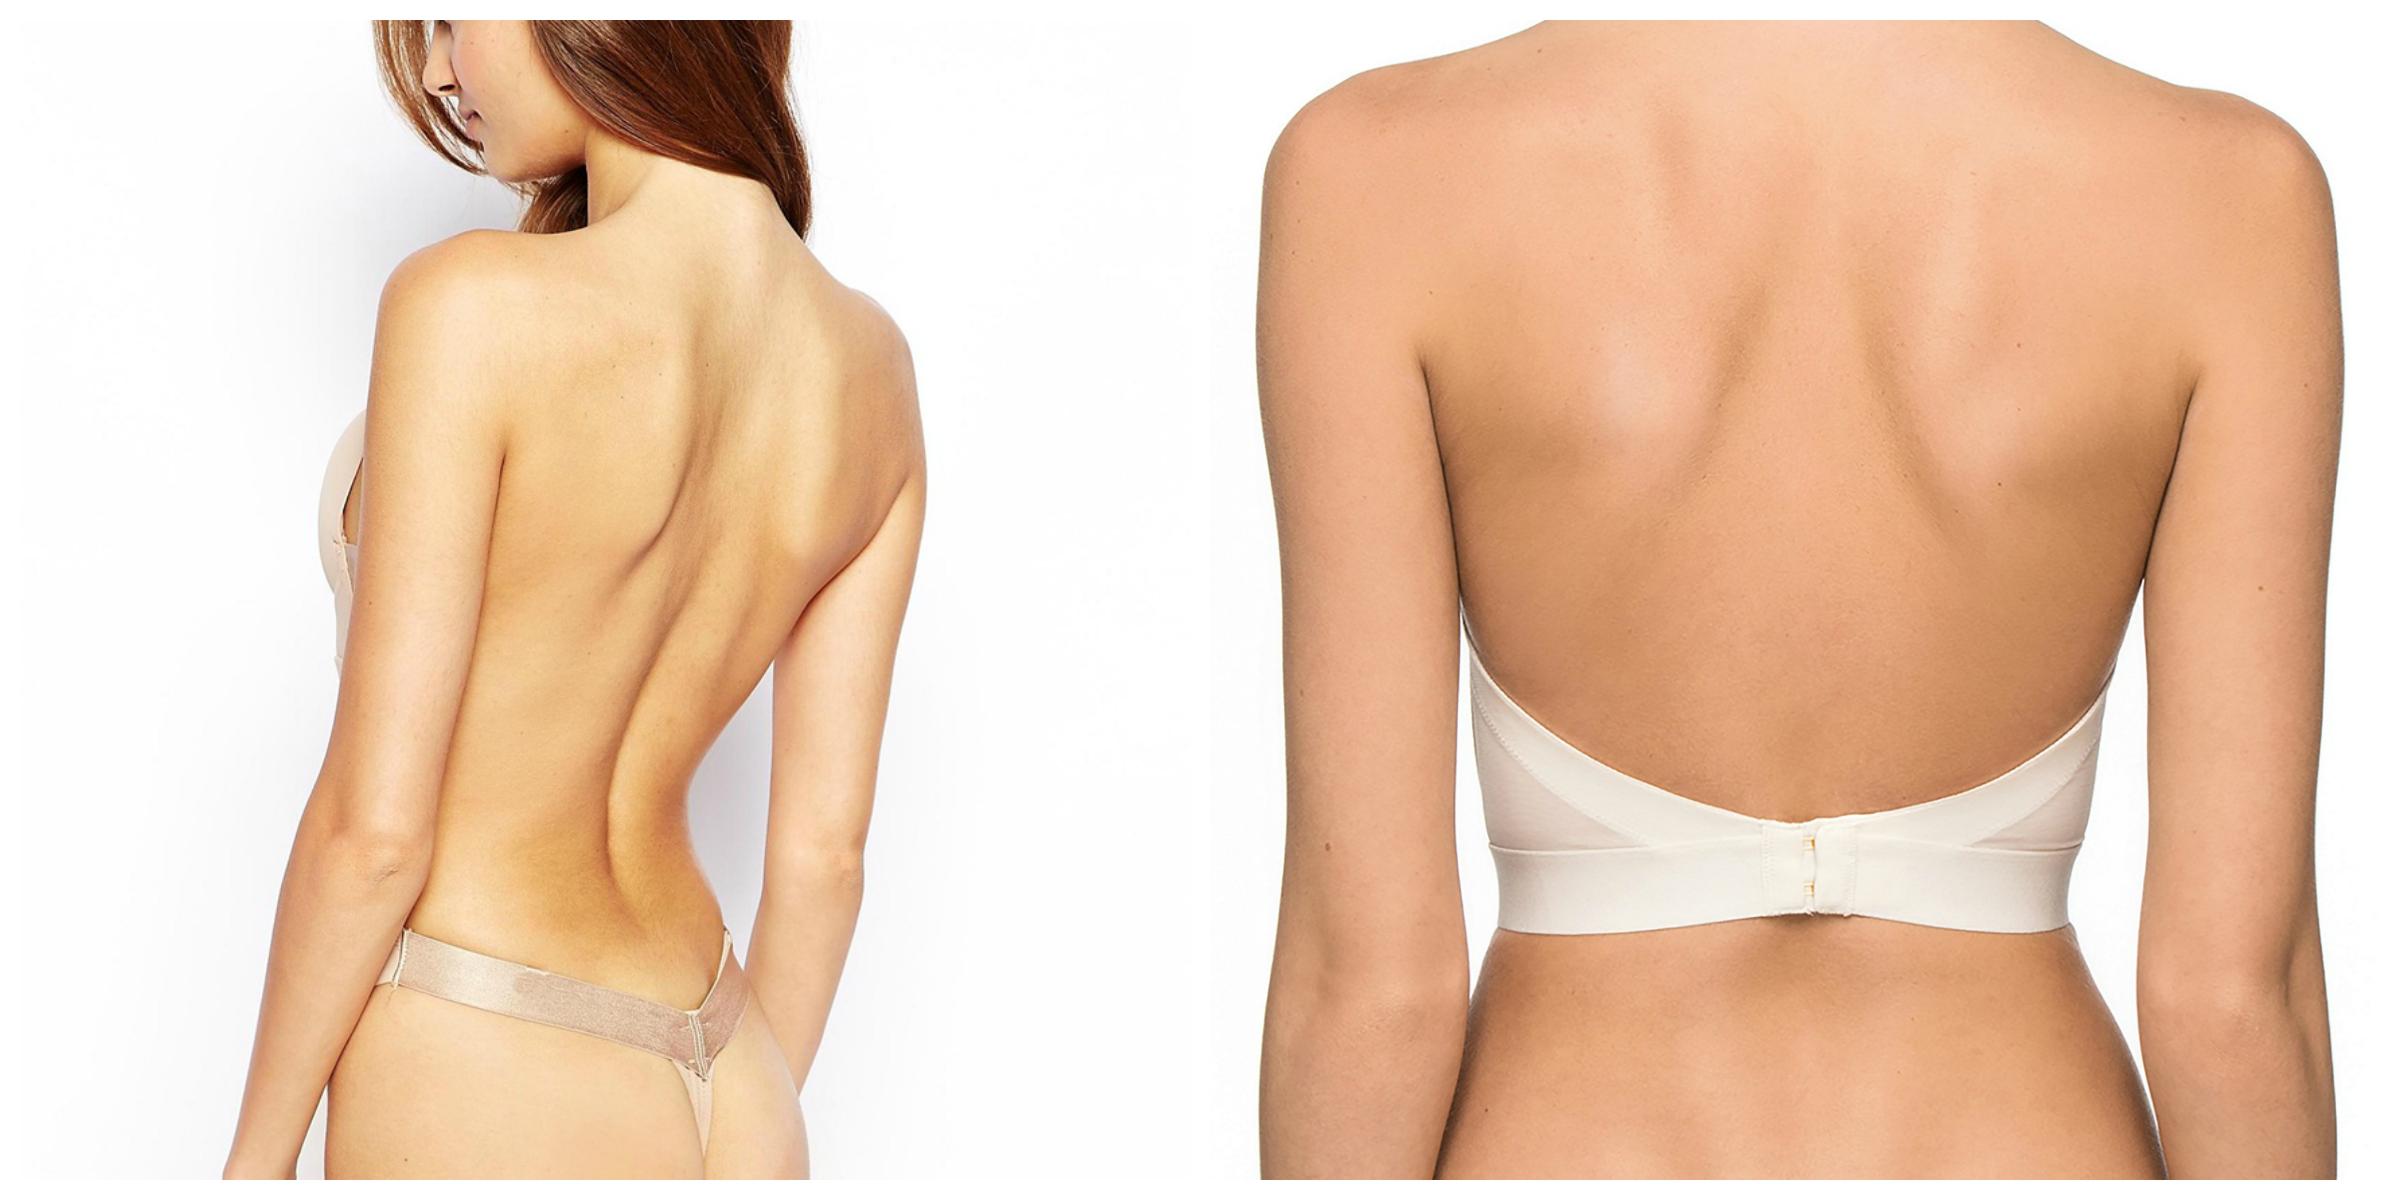 Low Back Strapless Bra For Wedding Dress Image Idea